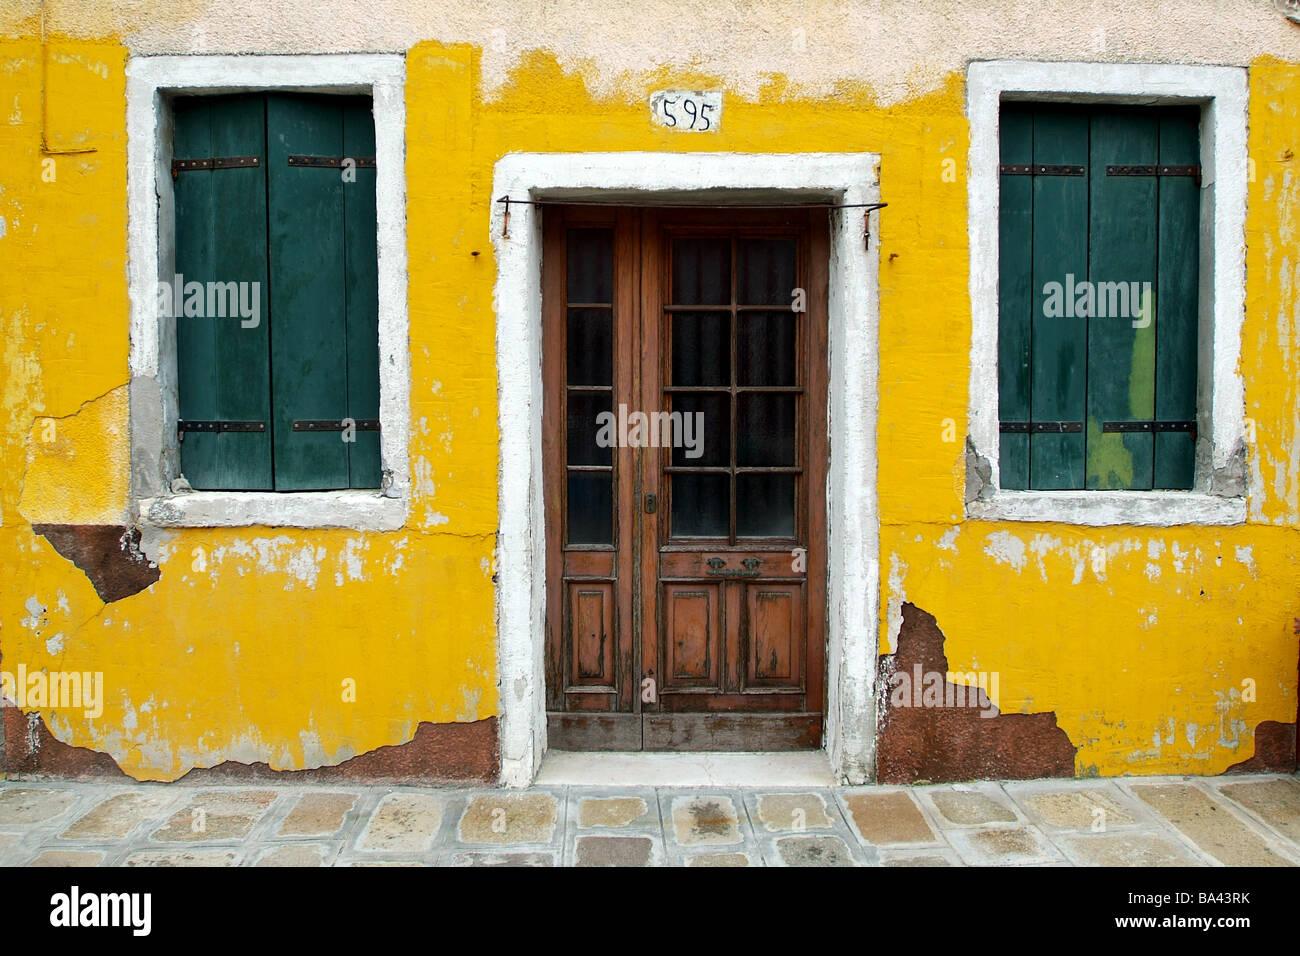 Gelbe Wand Grune Fensterladen Haus Detail Venedig Italien Stockfoto